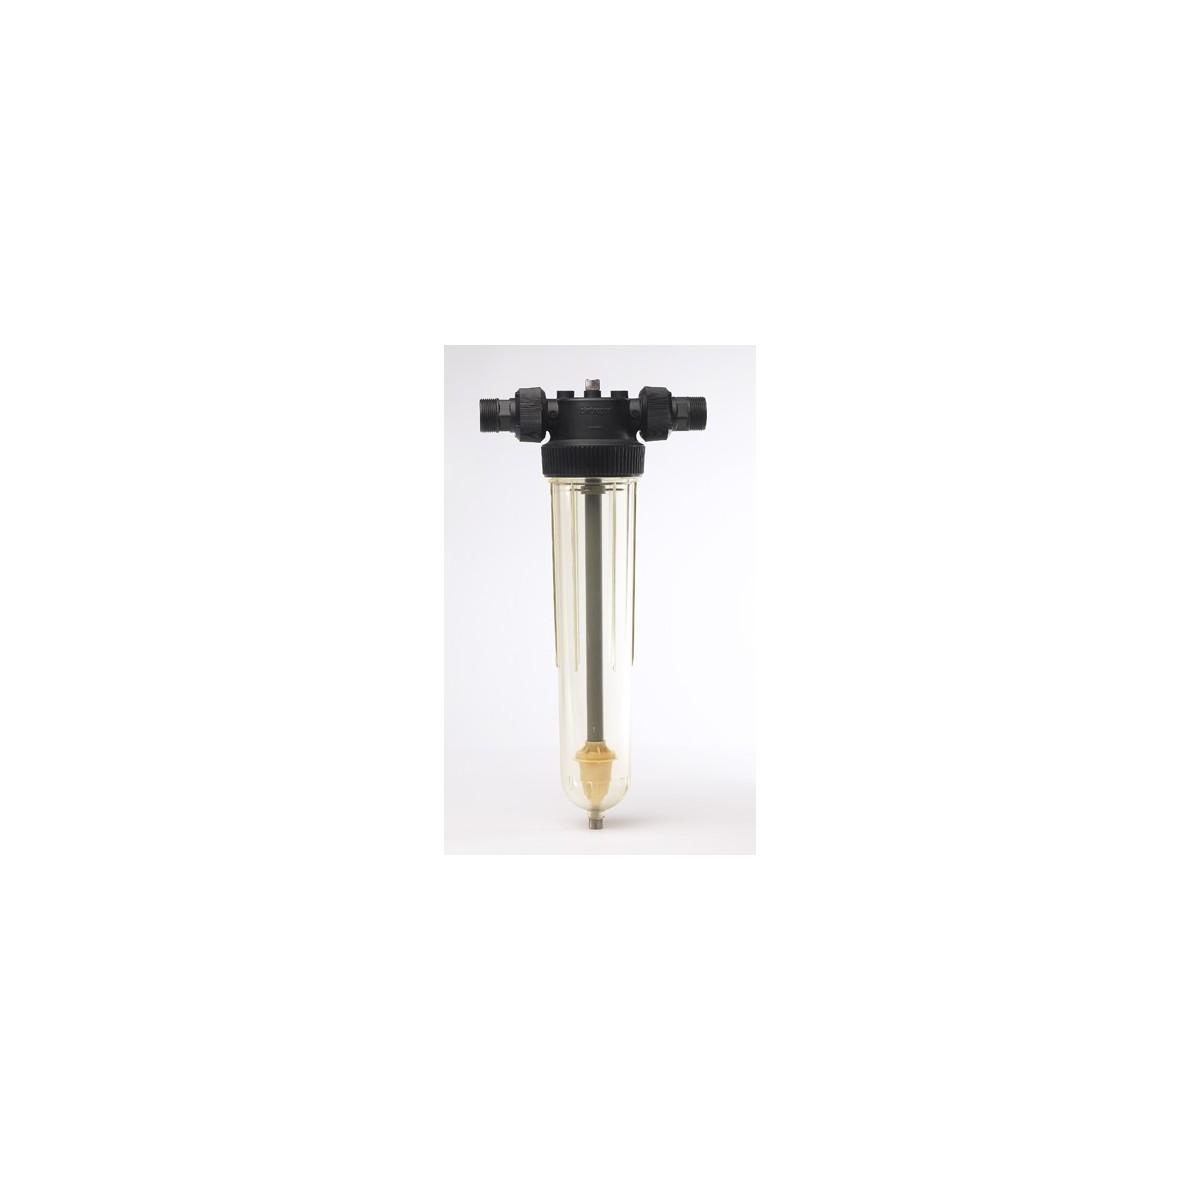 Filtr mechaniczny Cintropur NW 32 TE